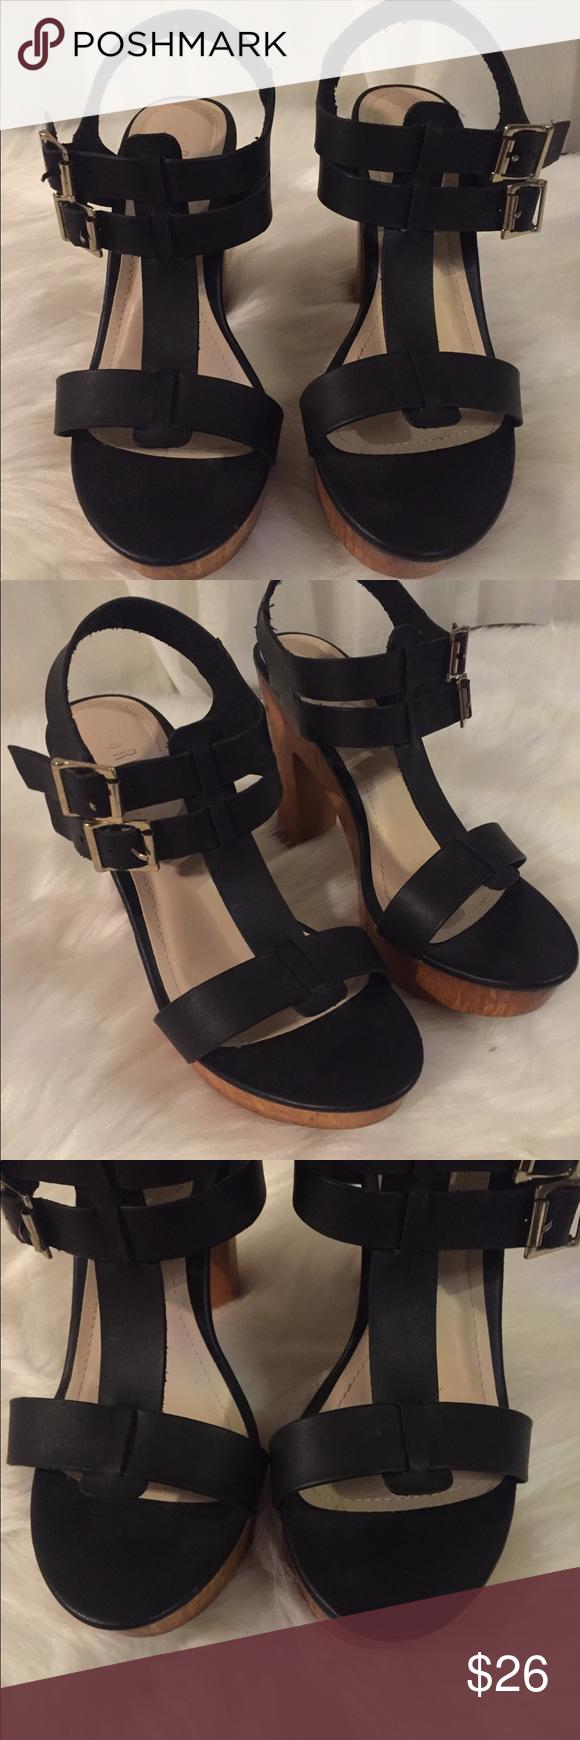 b9887ddbea97 ROUGE HELIUM HELLS SANDALS 👡 ROUGE HELIUM HELLS SANDALS 👡 Black size 9 Rouge  Helium Shoes Heels